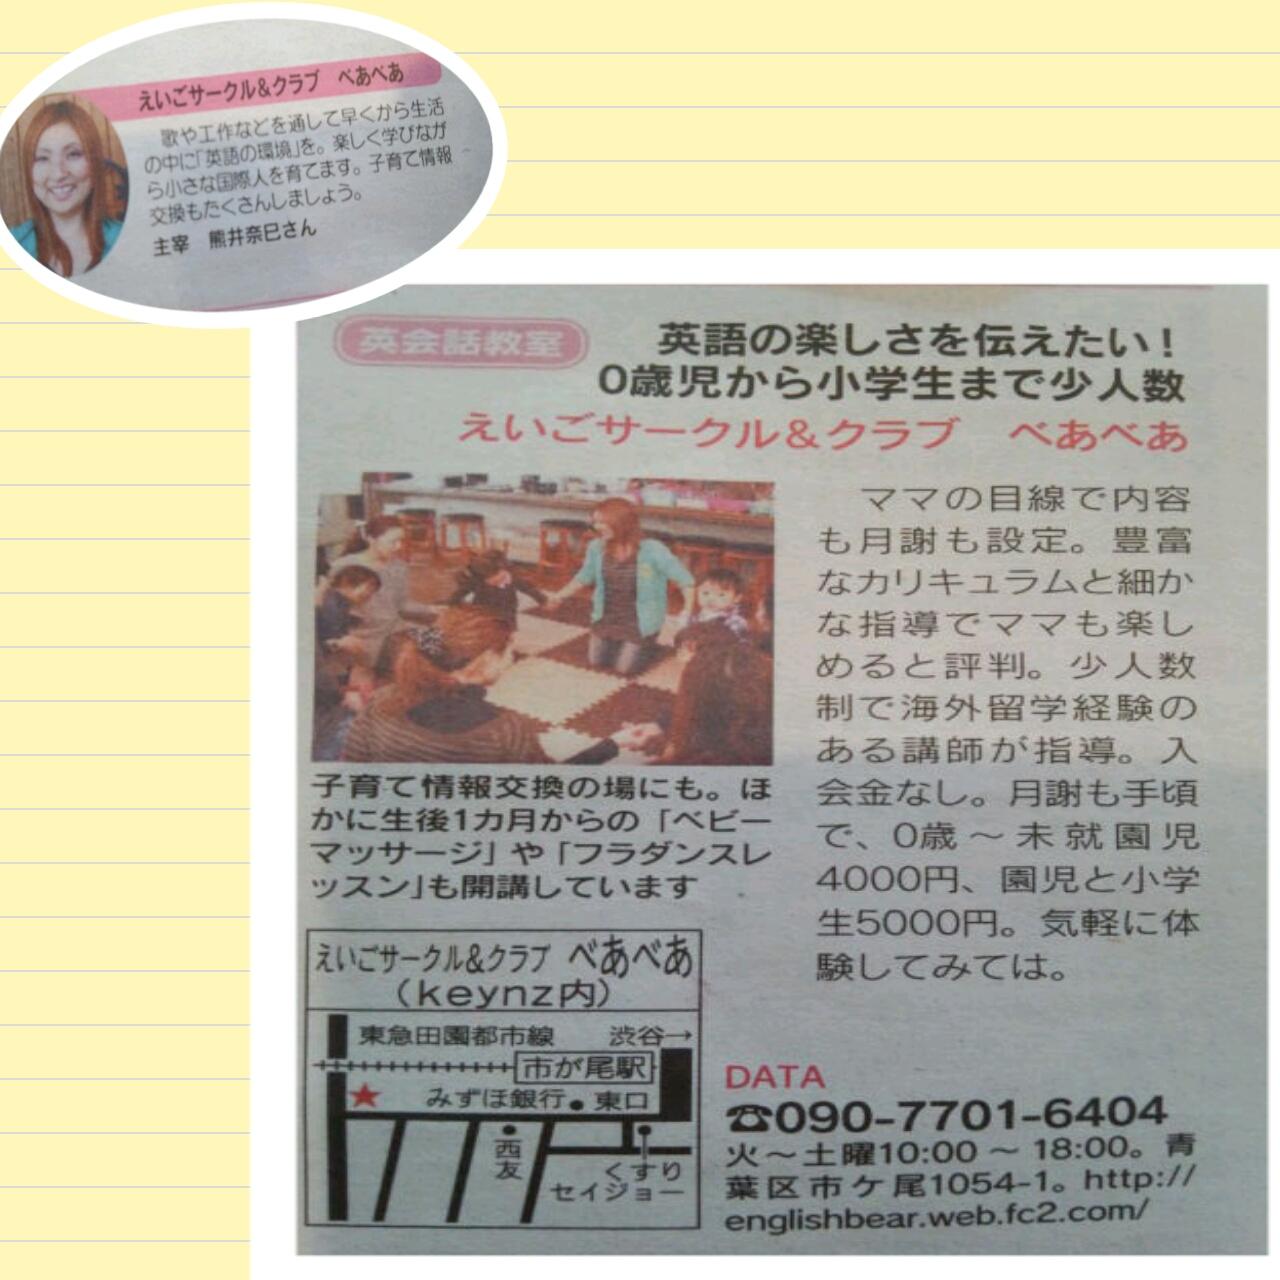 2014-02-22-09-16-55_deco.jpg